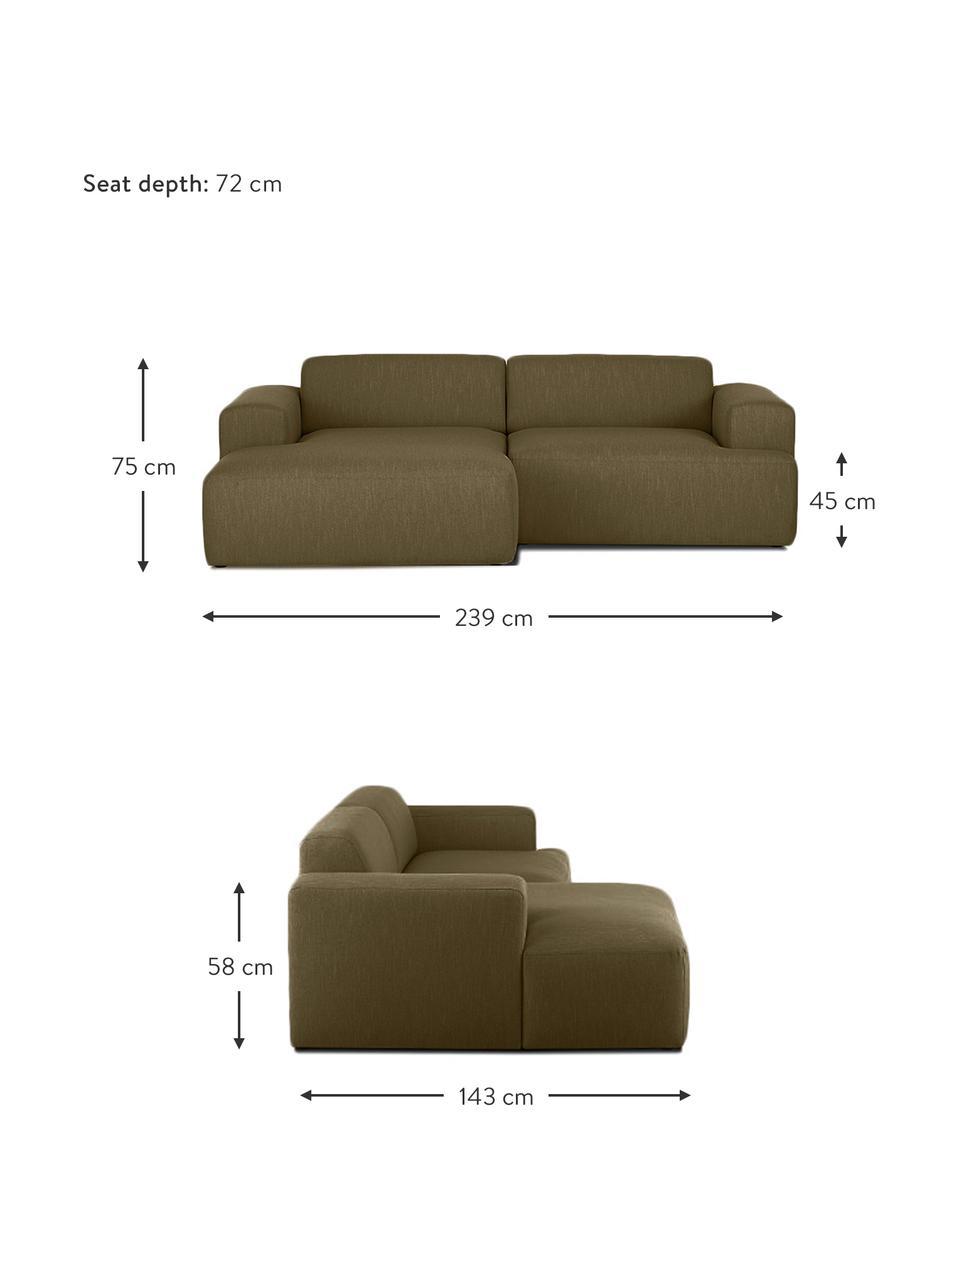 Ecksofa Melva (3-Sitzer) in Olivgrün, Bezug: 100% Polyester Der hochwe, Gestell: Massives Kiefernholz, FSC, Füße: Kunststoff, Webstoff Olivgrün, B 239 x T 143 cm